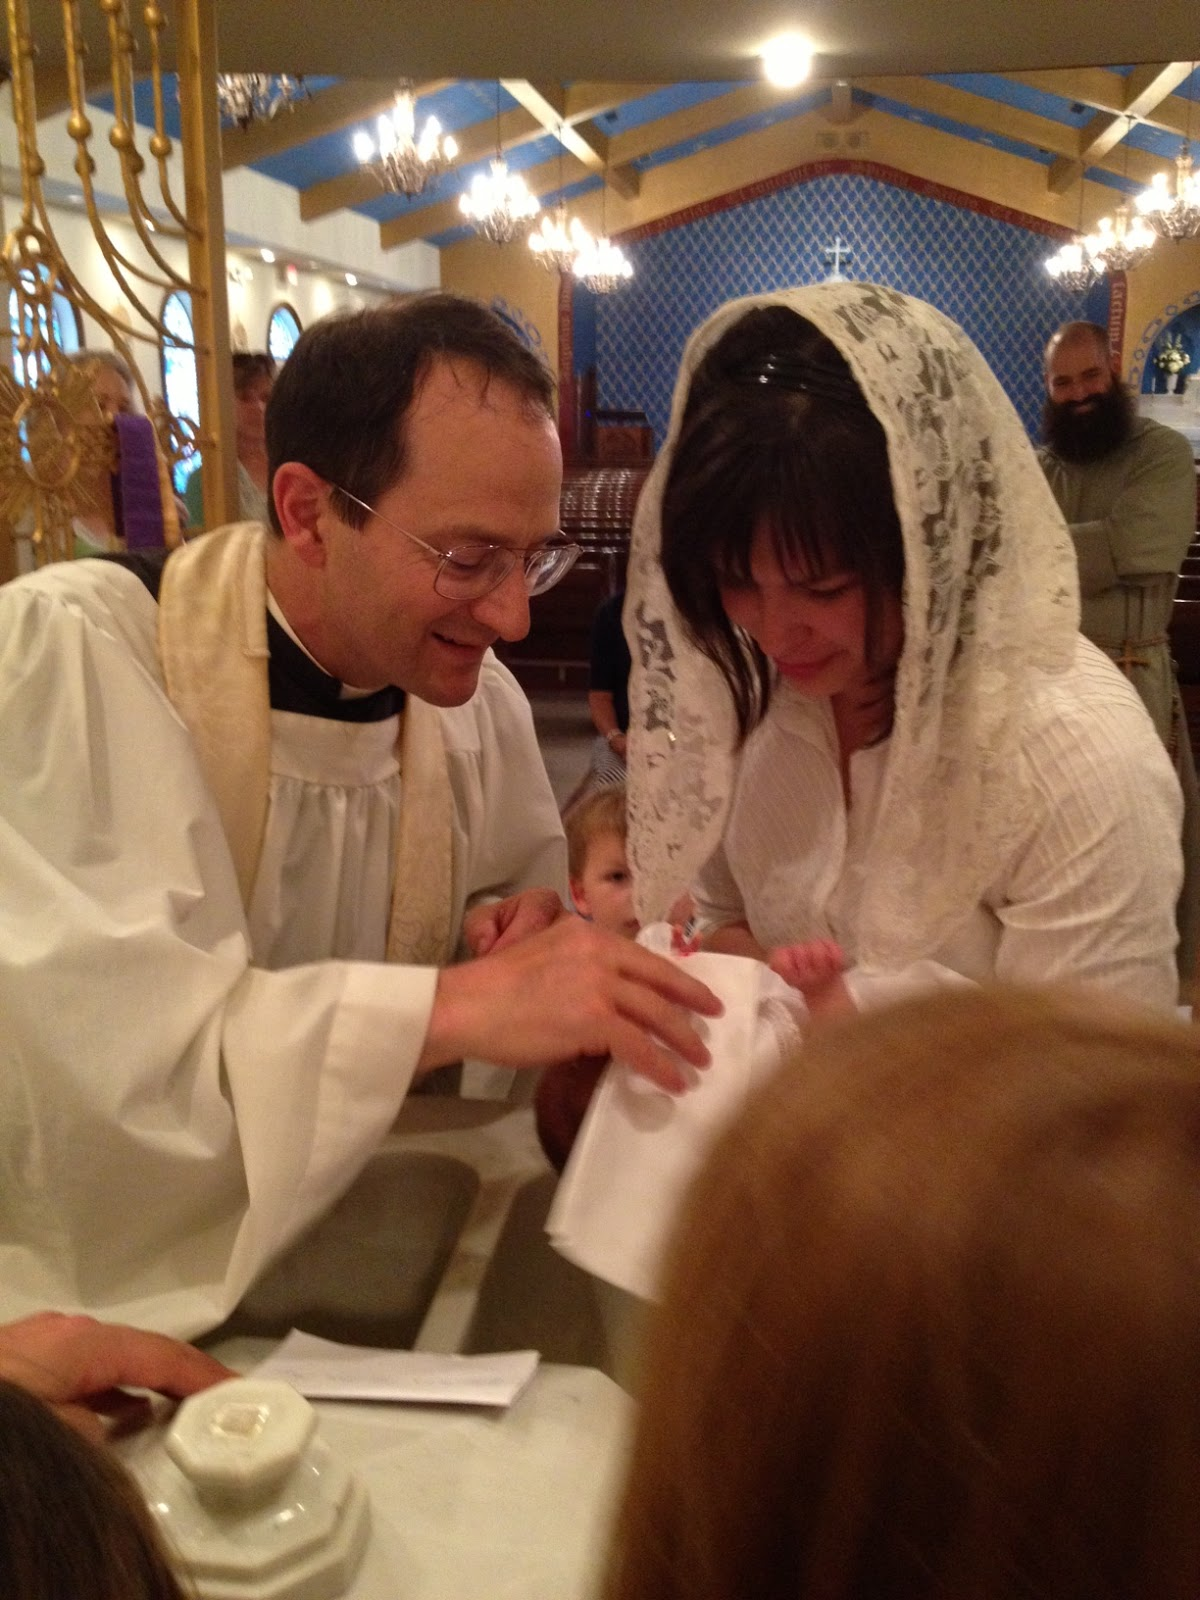 Exorcism Satan And The Baptismal Liturgy Outside The